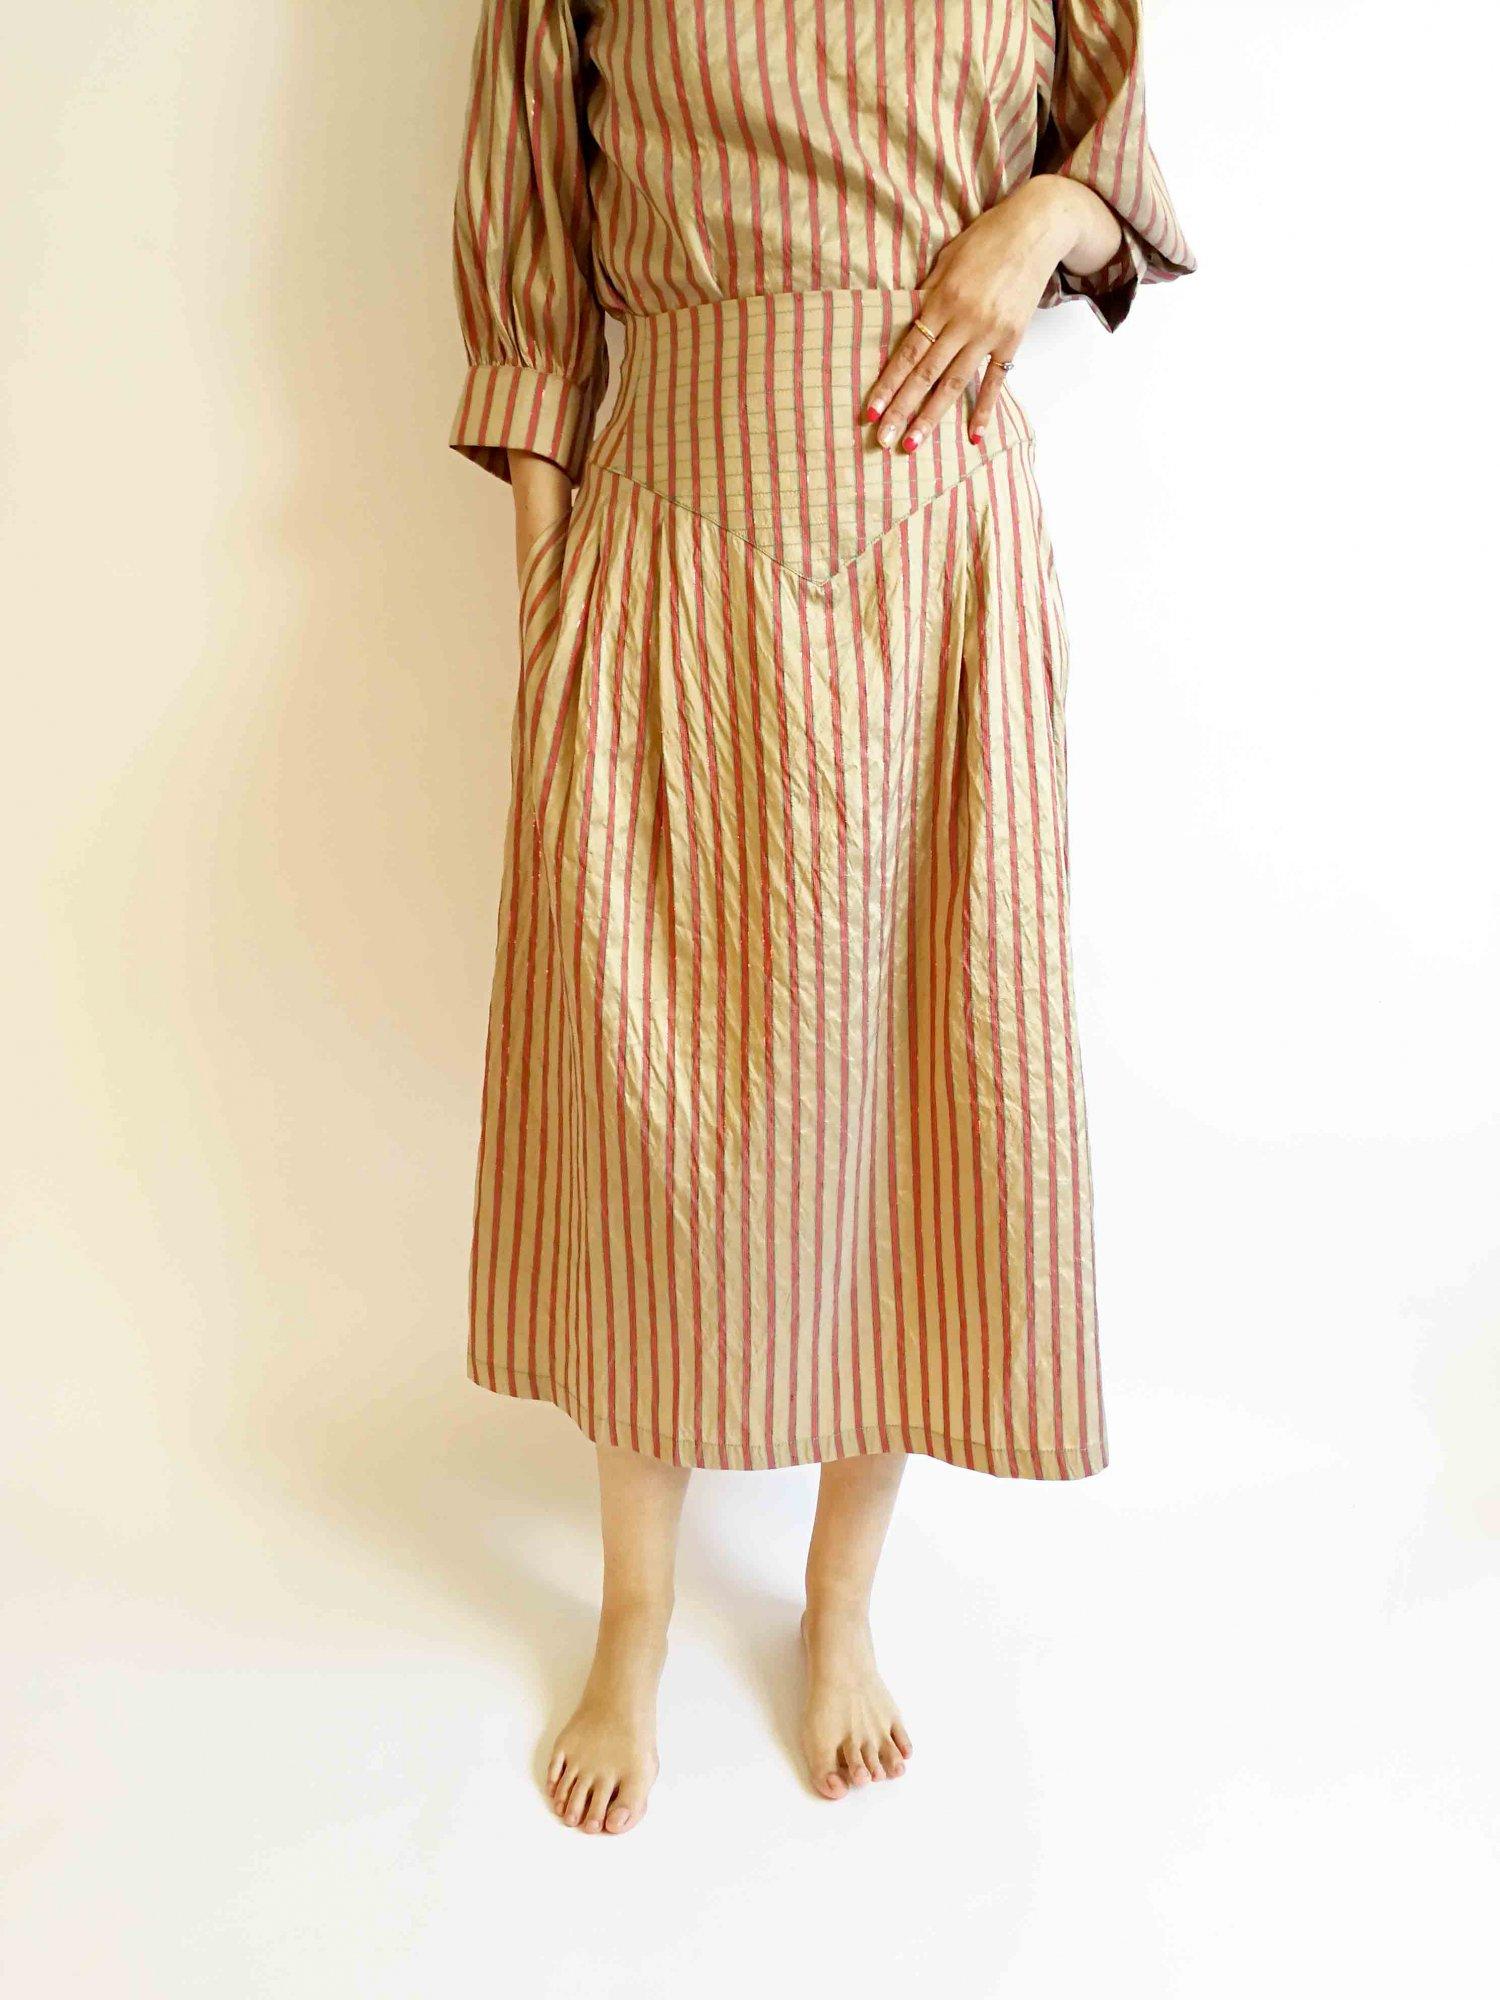 Midi Skirt / original beige